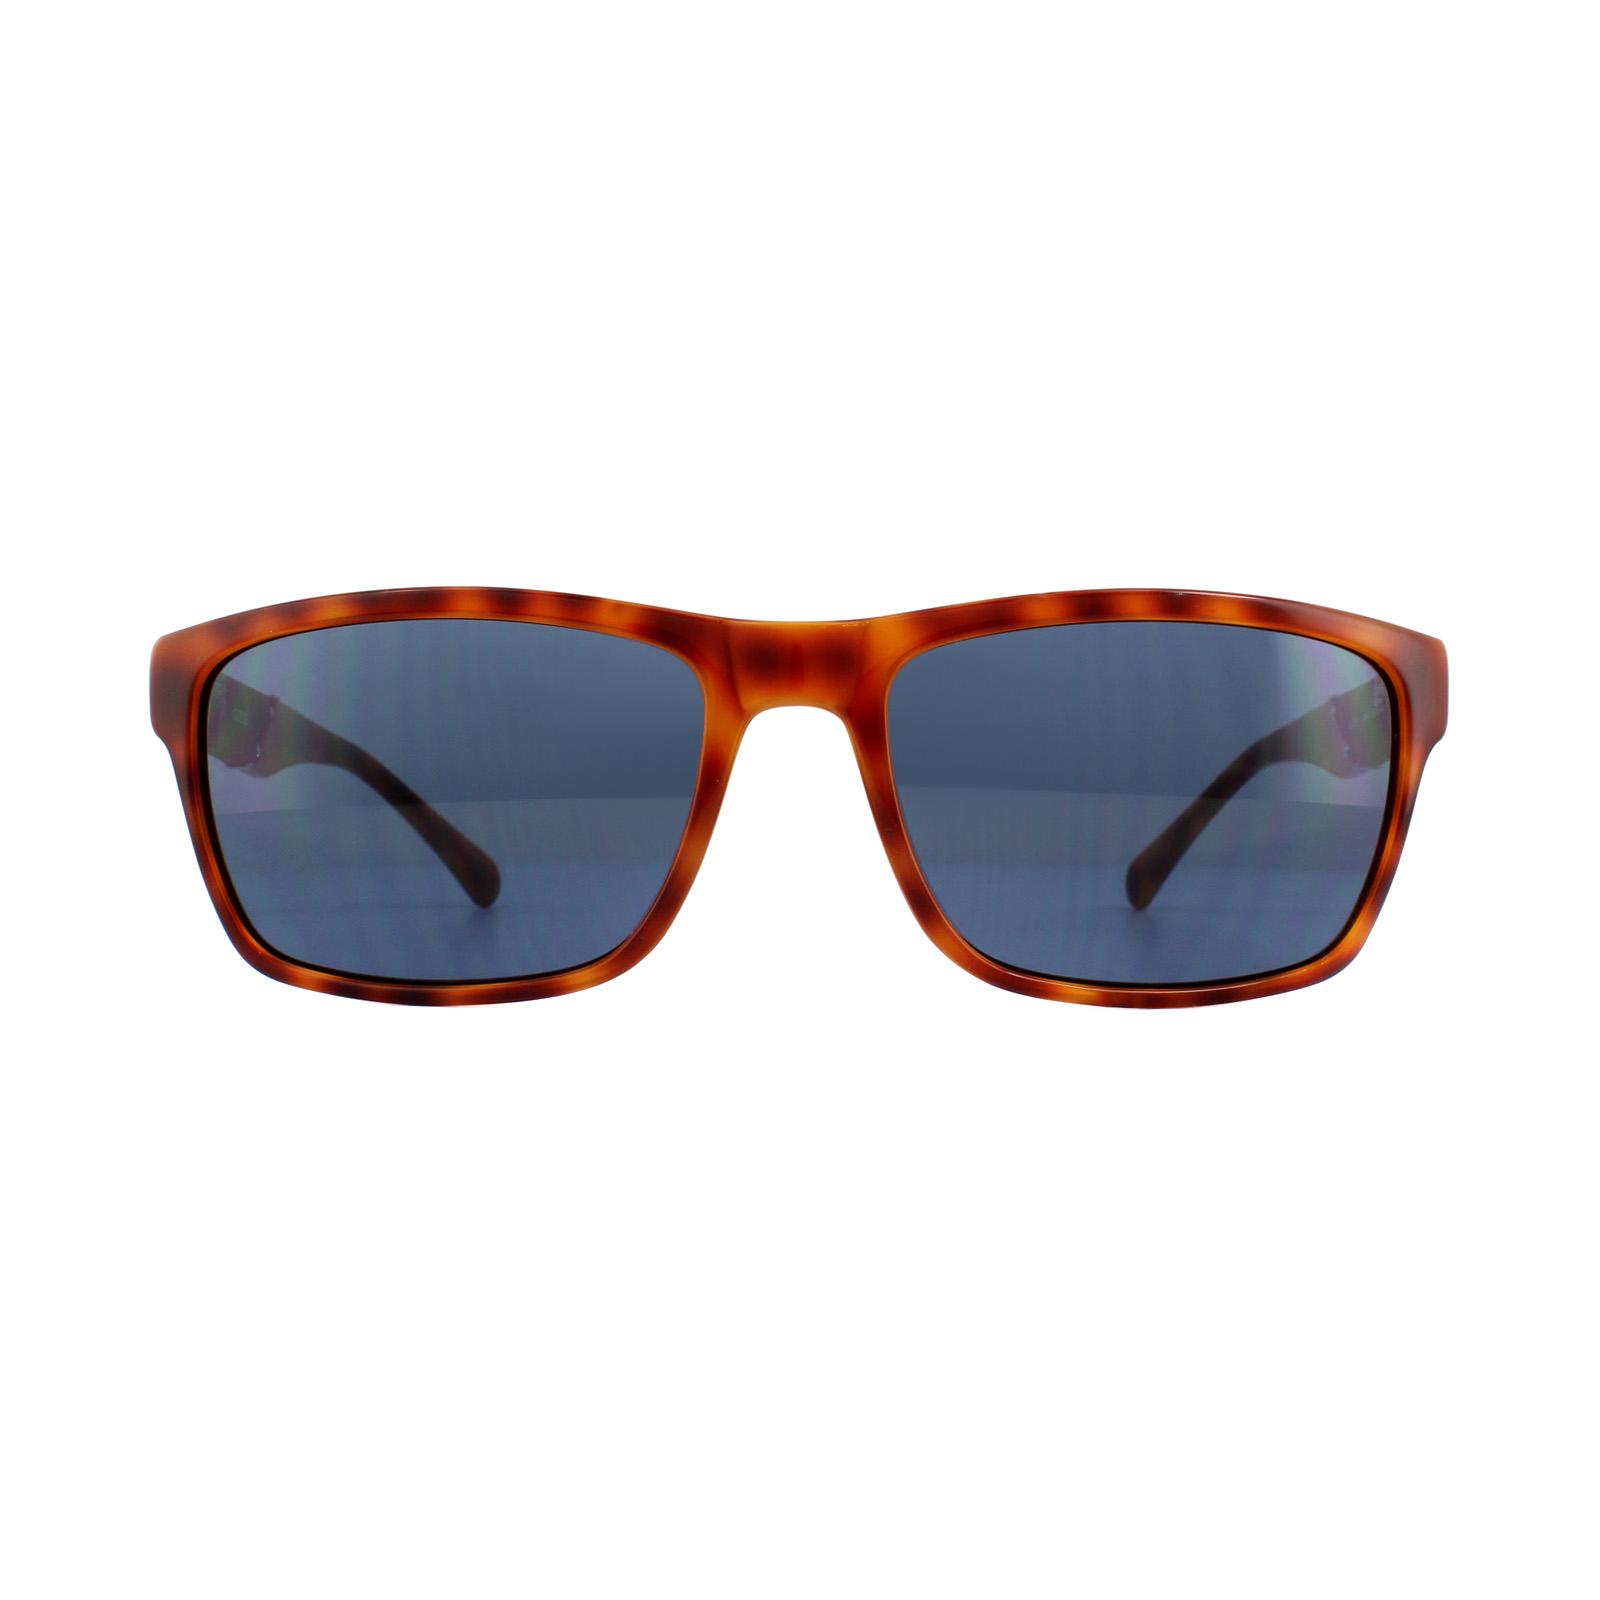 6aff887a52 Guess Sunglasses GU6756 HNY9 Honey Tortoise Blue 715583725942